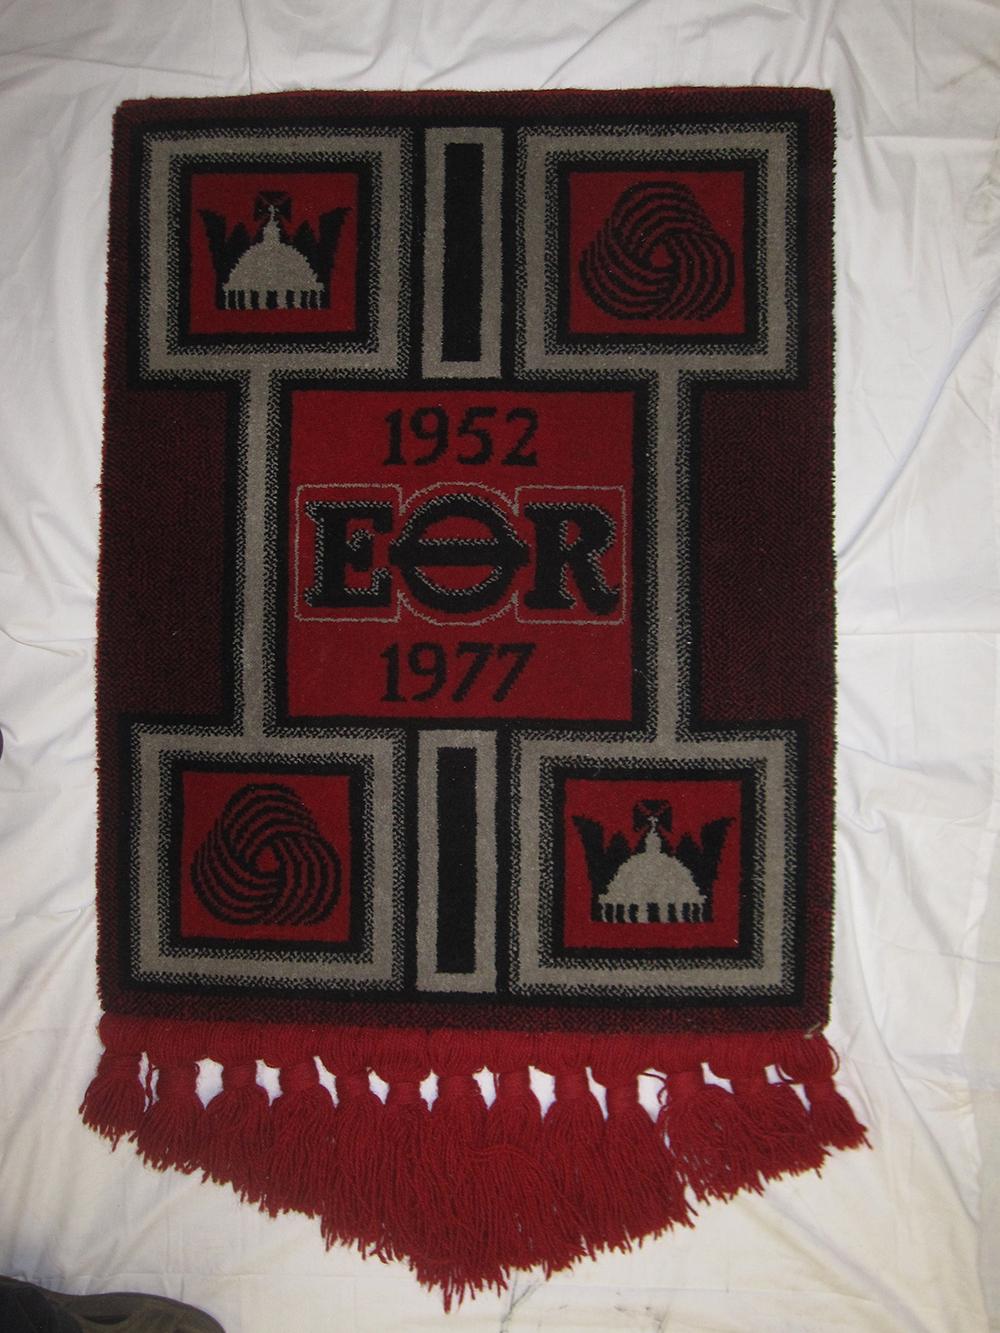 Underground Railway Wool Carpet To Celebrate The